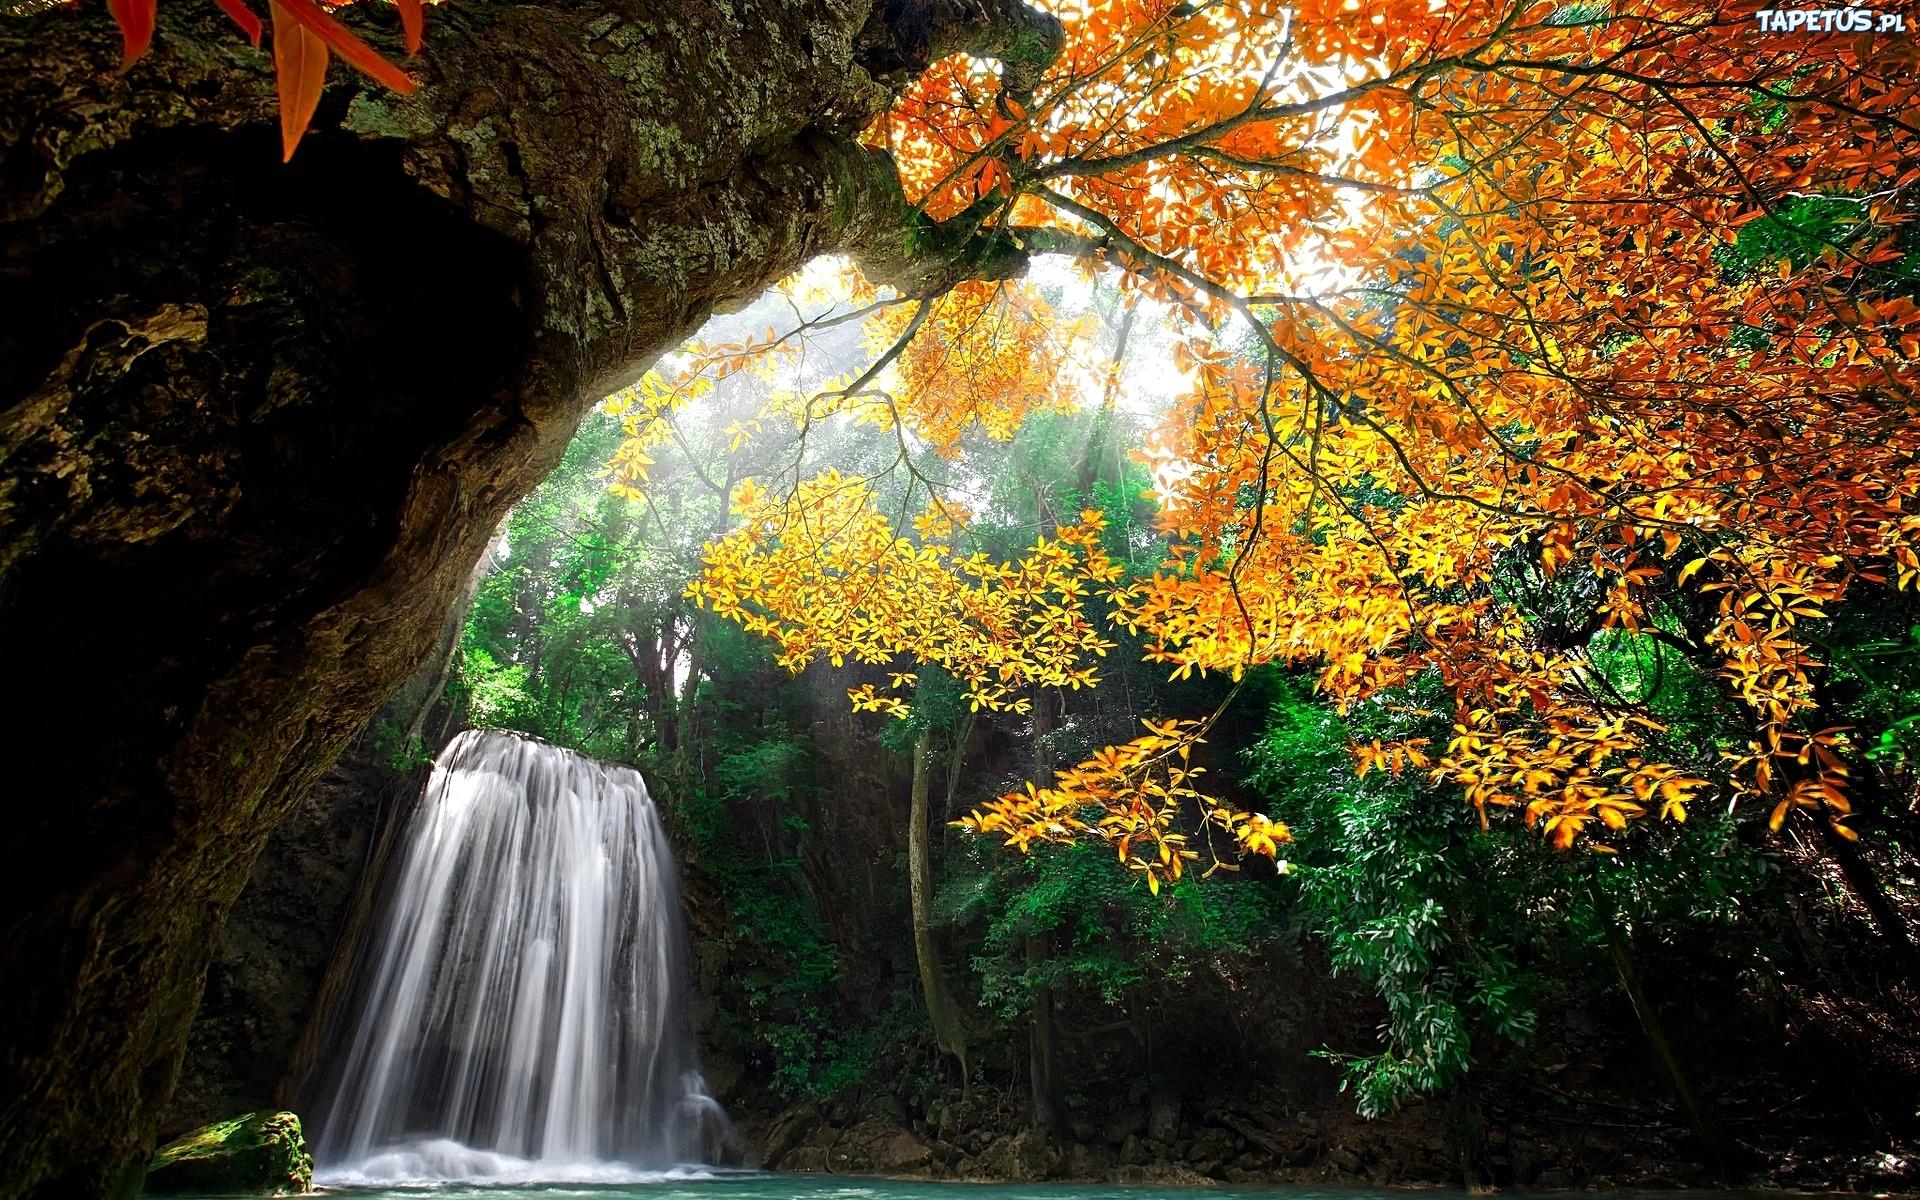 природа водопад деревья осень дом nature waterfall trees autumn the house загрузить